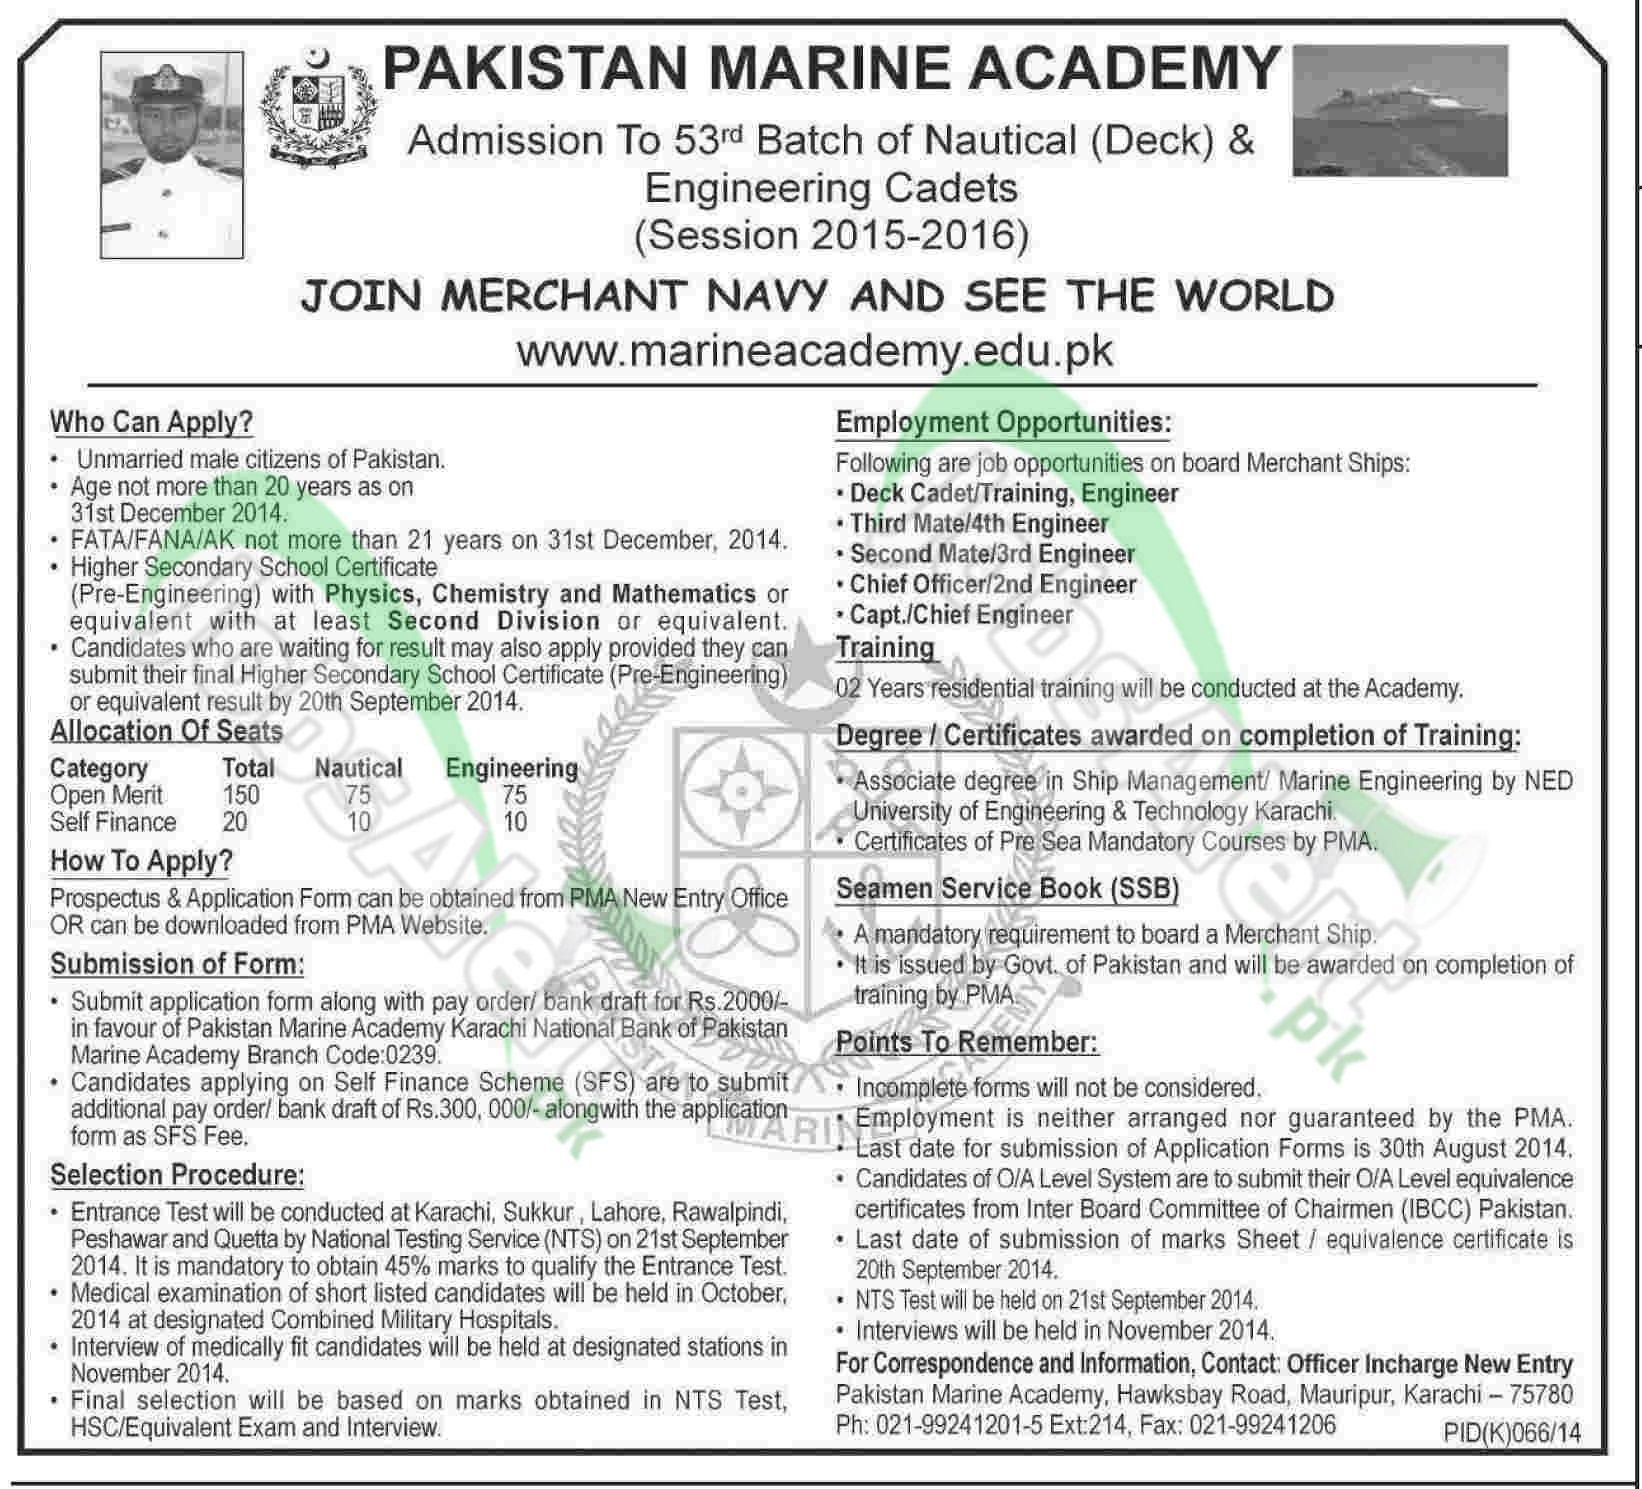 Pakistan Marine Academy 53rd Batch Admission 2015 Deck